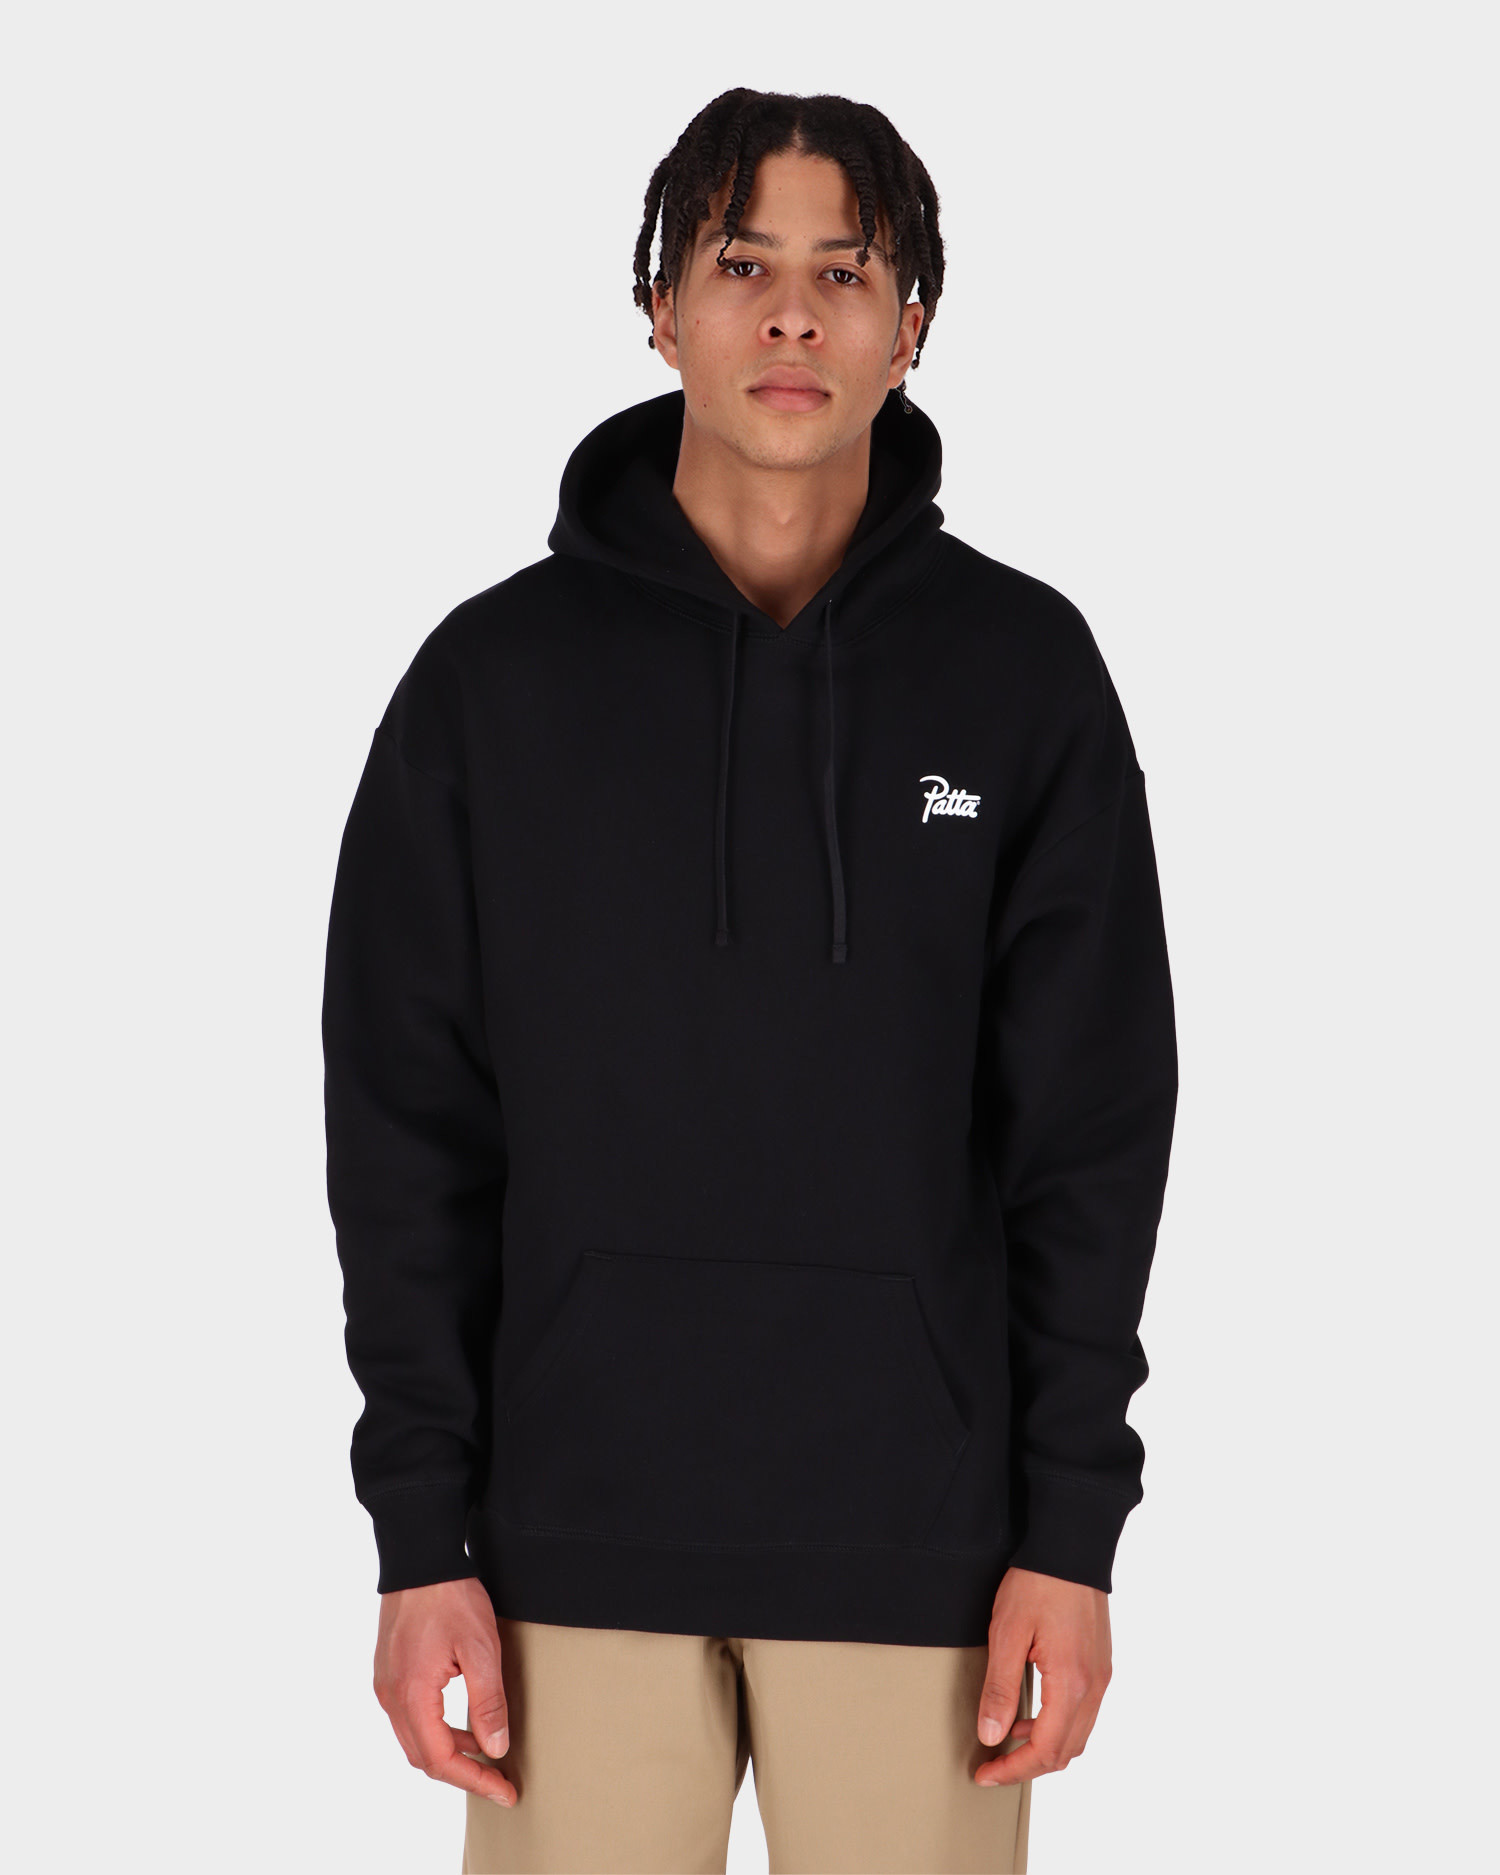 Patta Basic Summer Hooded Sweater Black